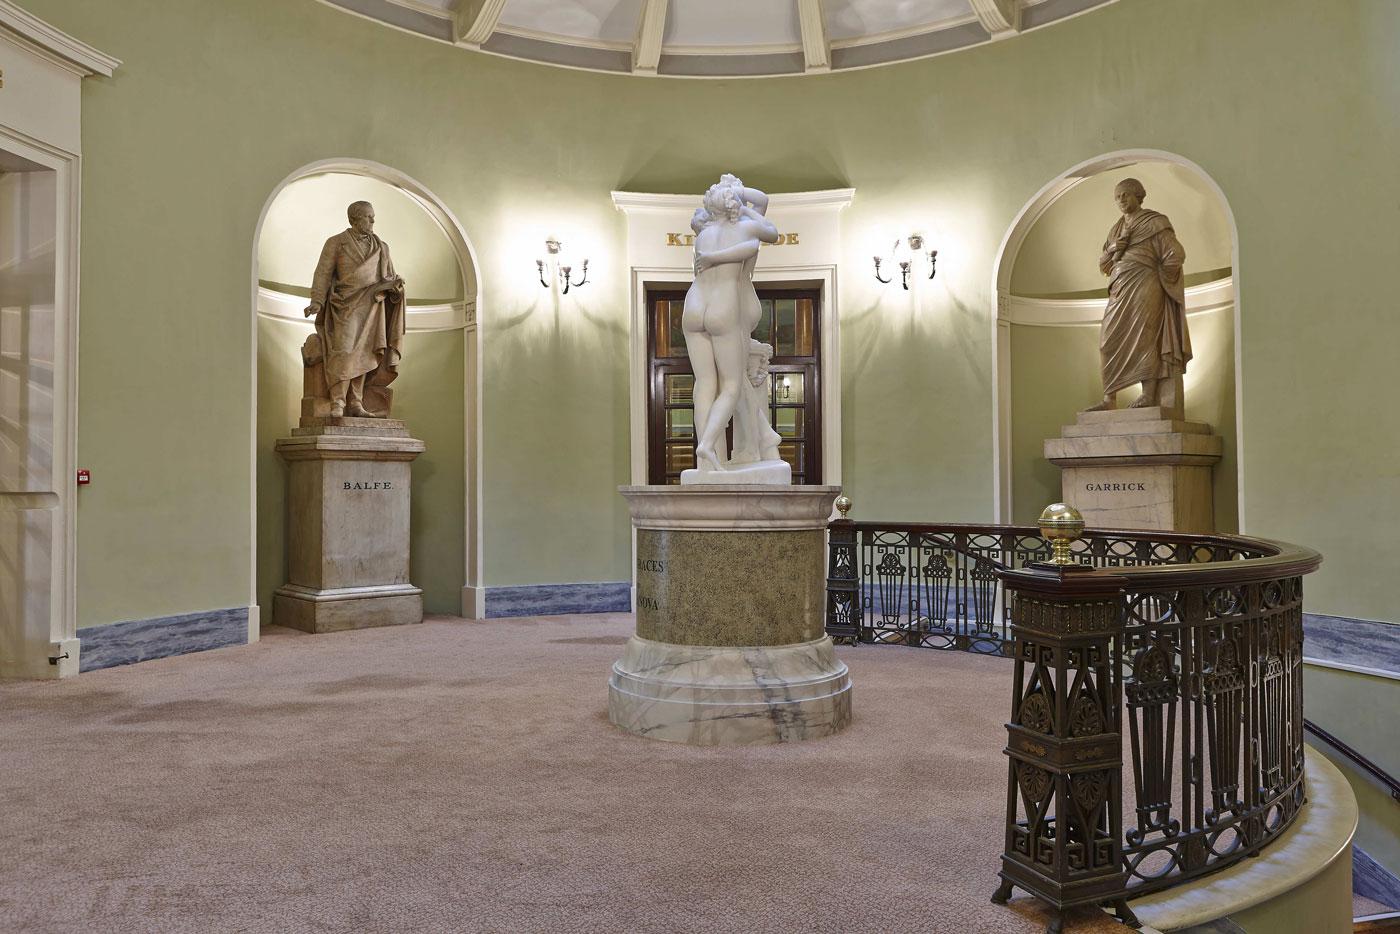 Theatre Royal Rotunda Balcony, Willy Wonka, Drury Lane London | London Interior Photography | Commercial Interiors Photographers